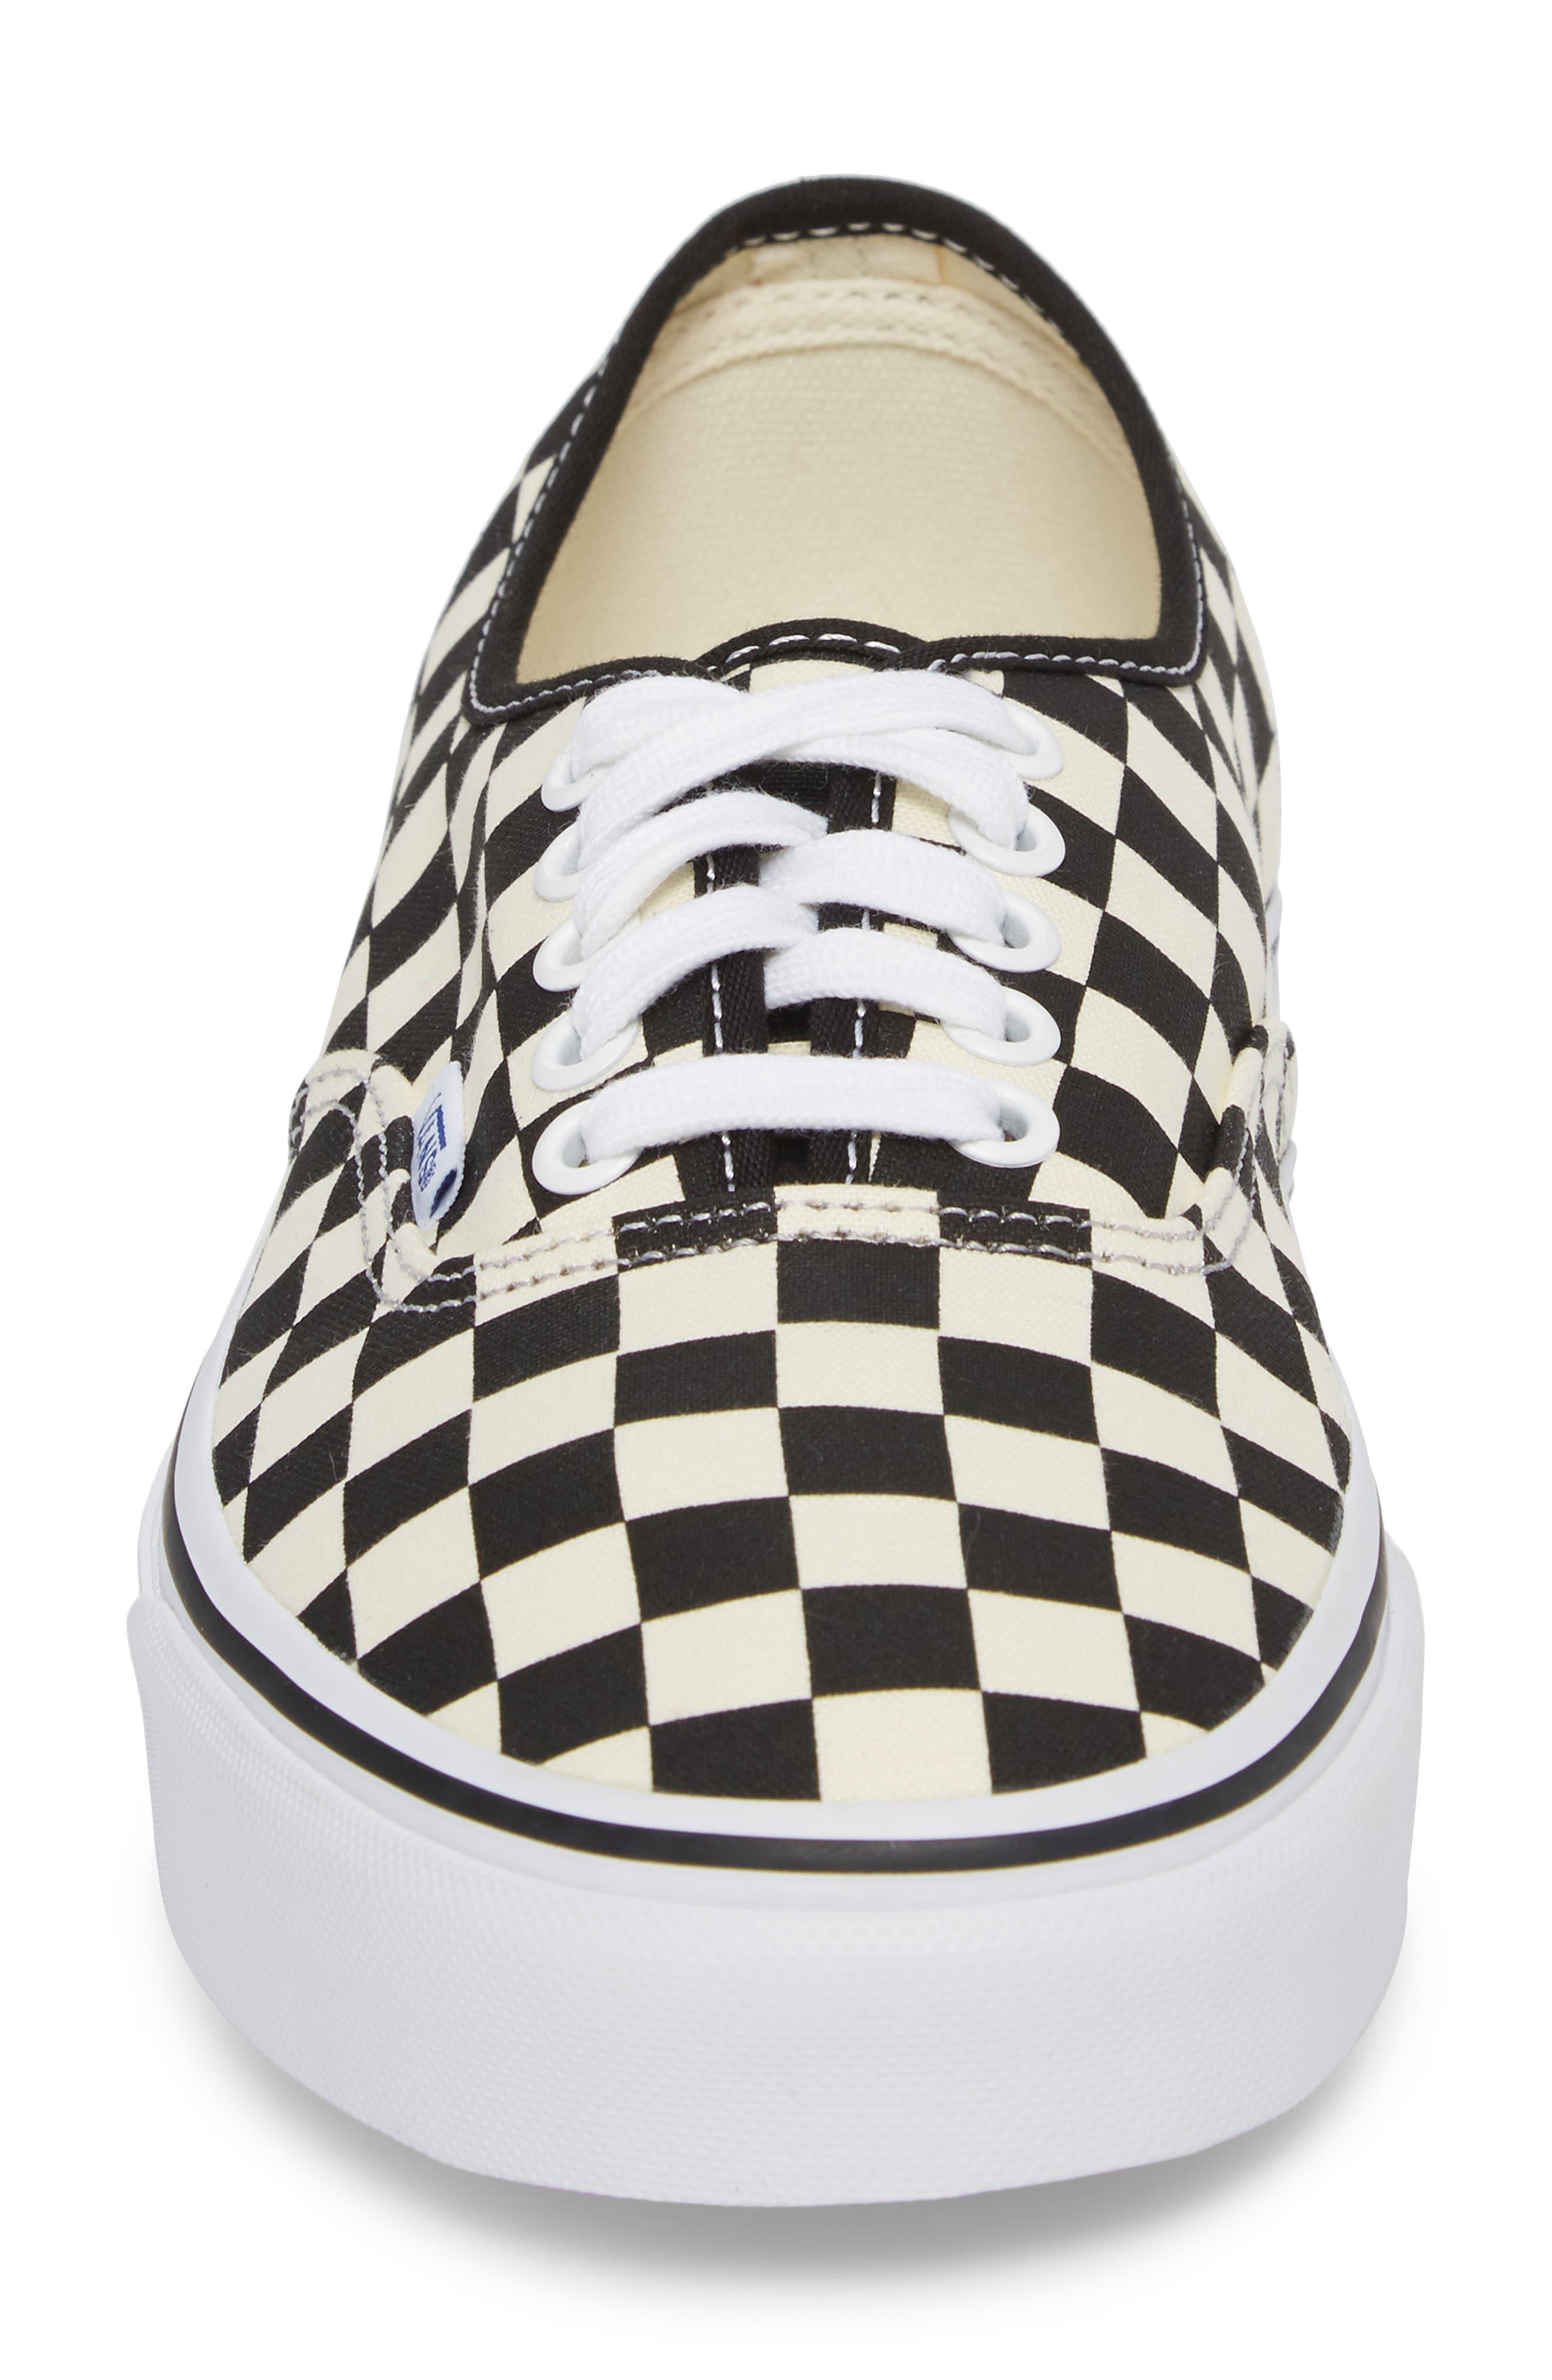 Authentic Golden Coast Sneaker,                             Alternate thumbnail 4, color,                             Black/ White Checker